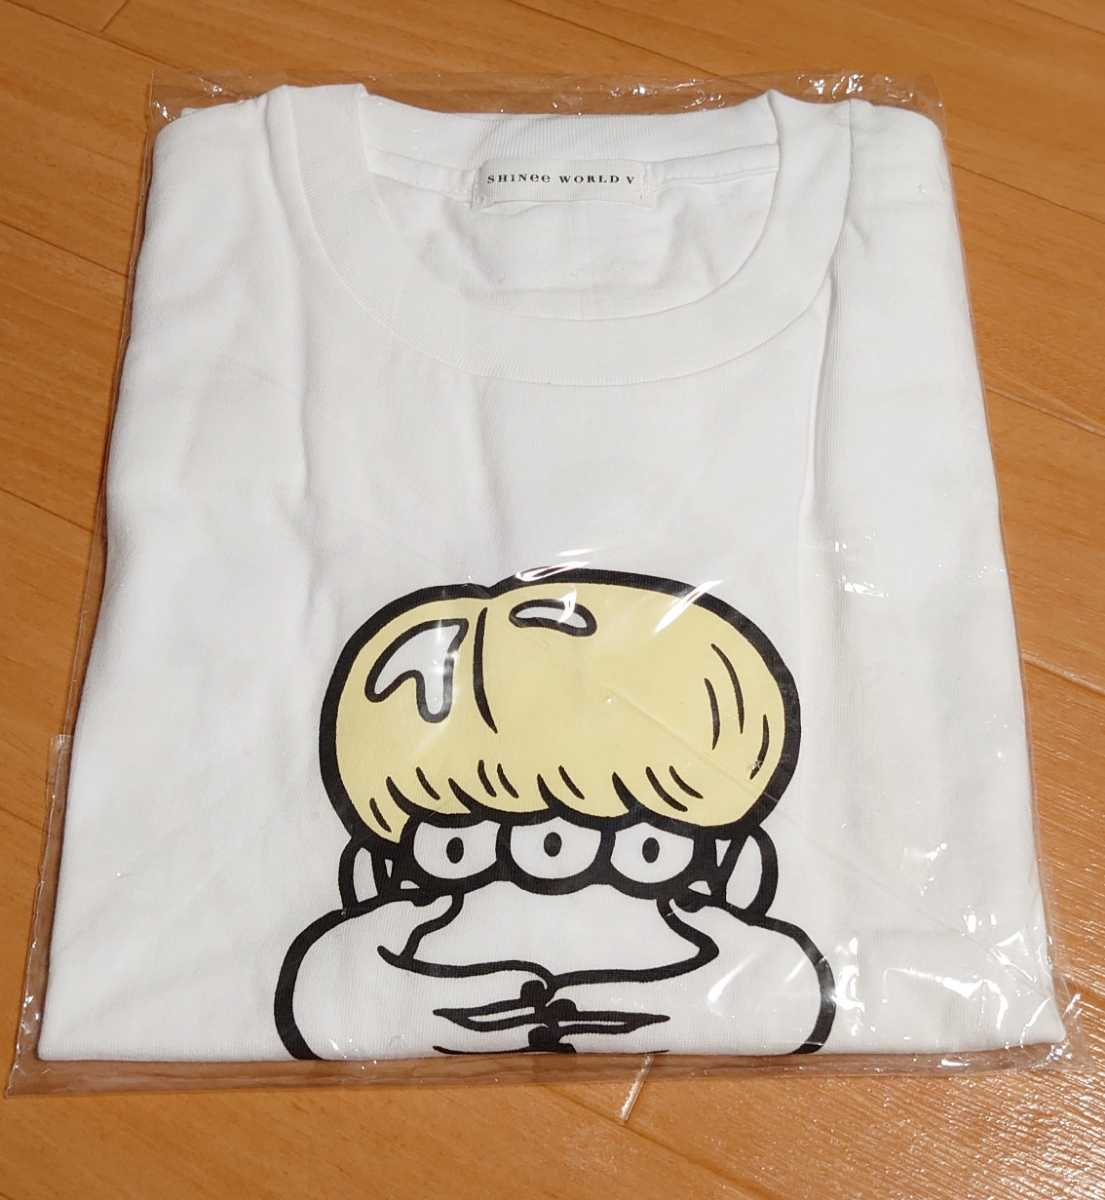 SHINee WORLD V 公式 Tシャツ【ジョンヒョン/JONGHYUN】新品未開封 フリーサイズ 韓国_画像1